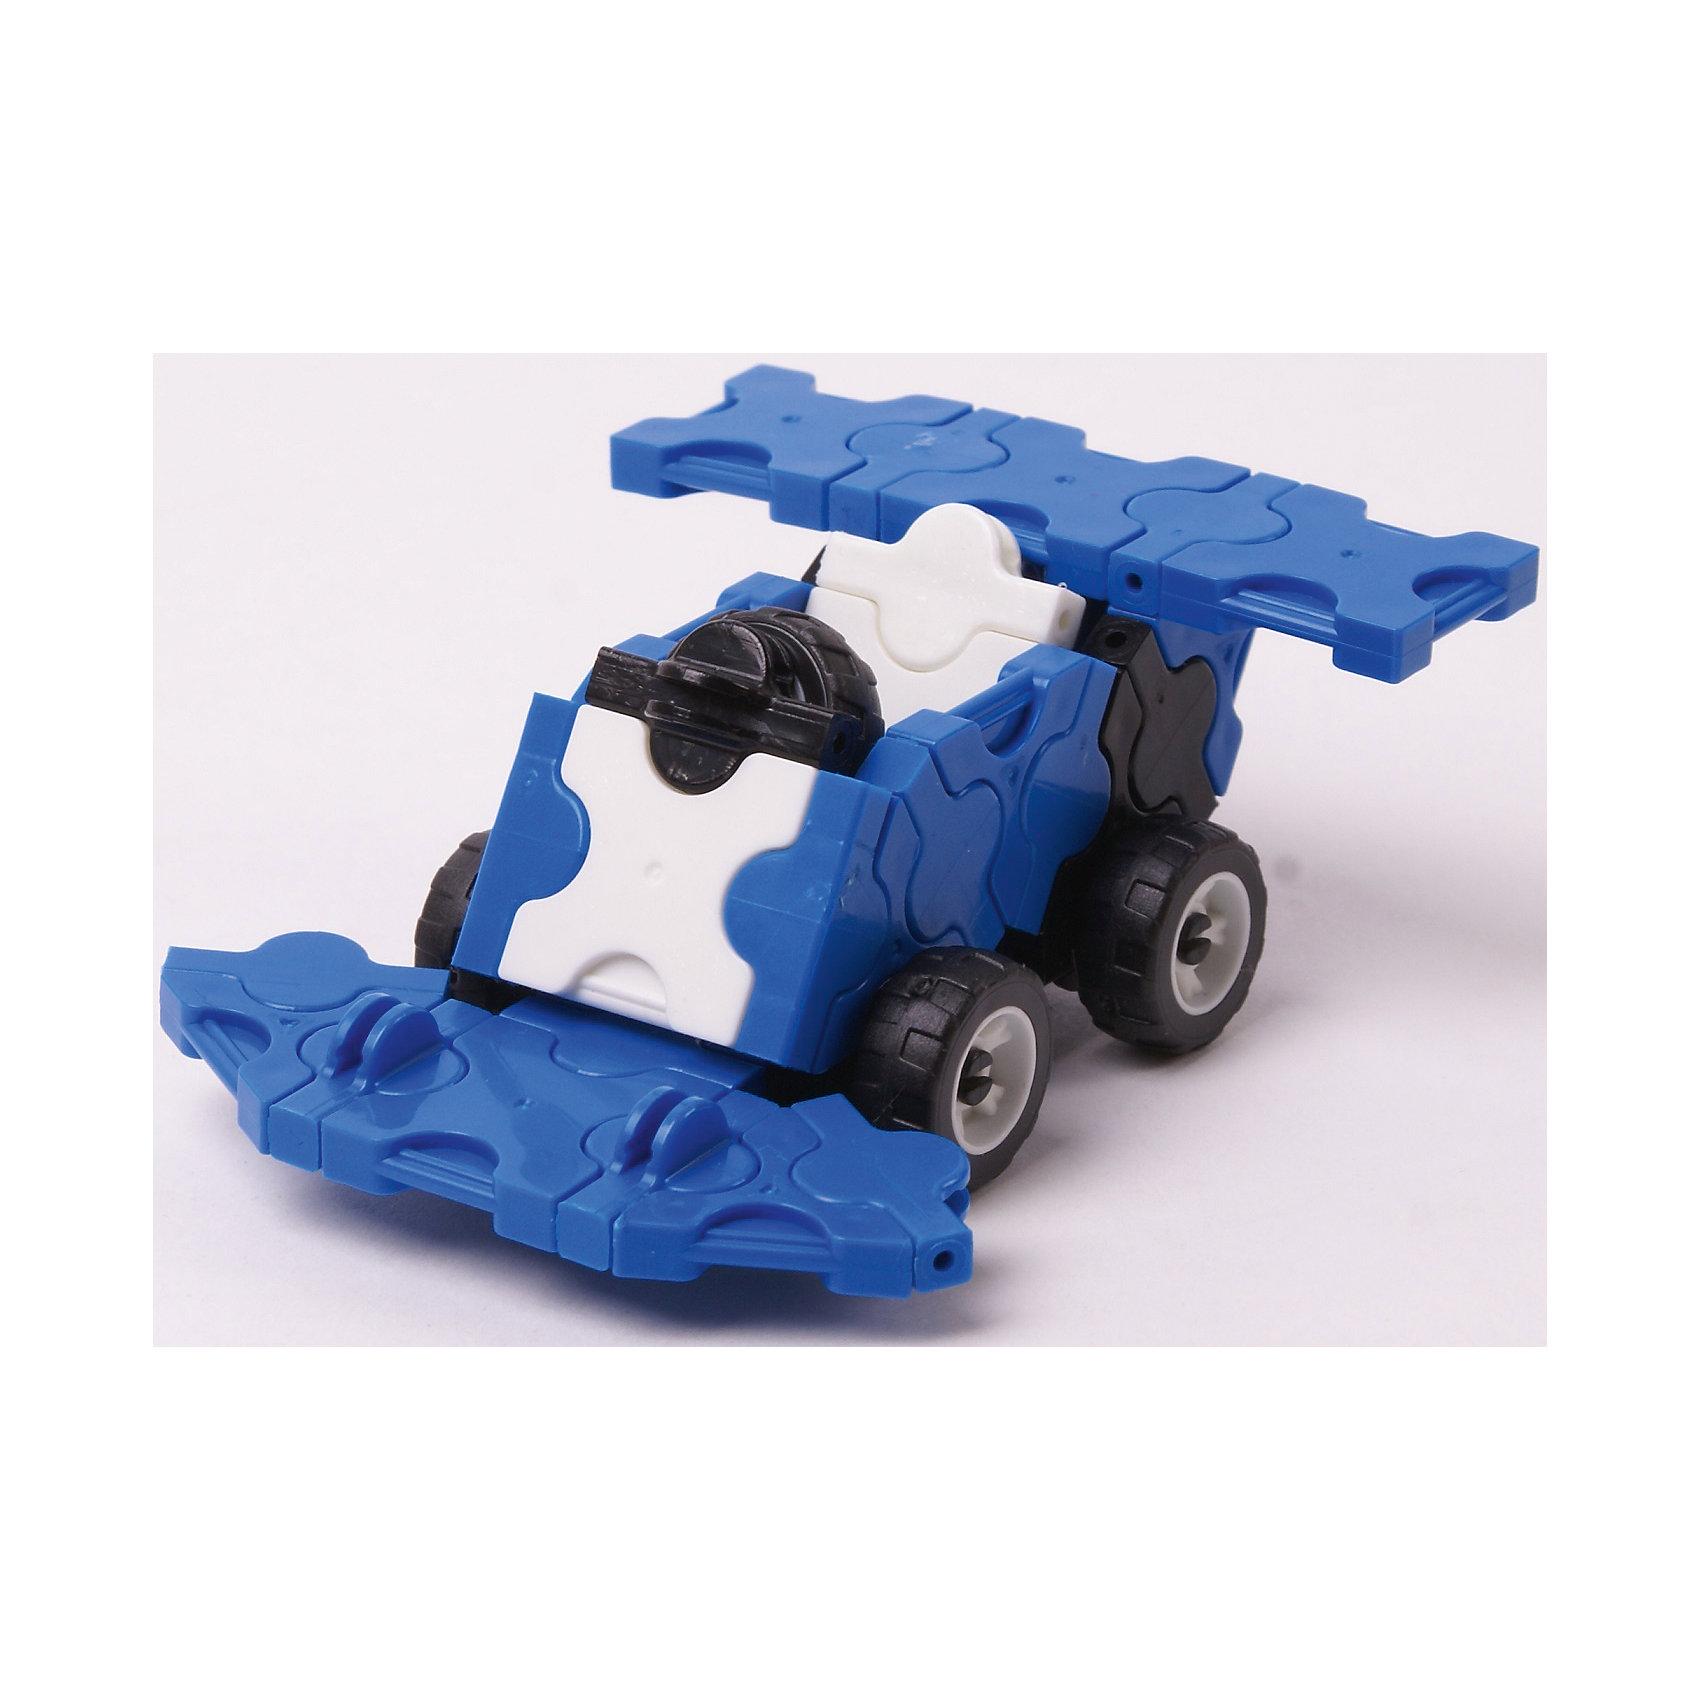 - Конструктор Автомобиль Спорткар синий, AVToys купить автомобиль б у в донецке до 33000 грн